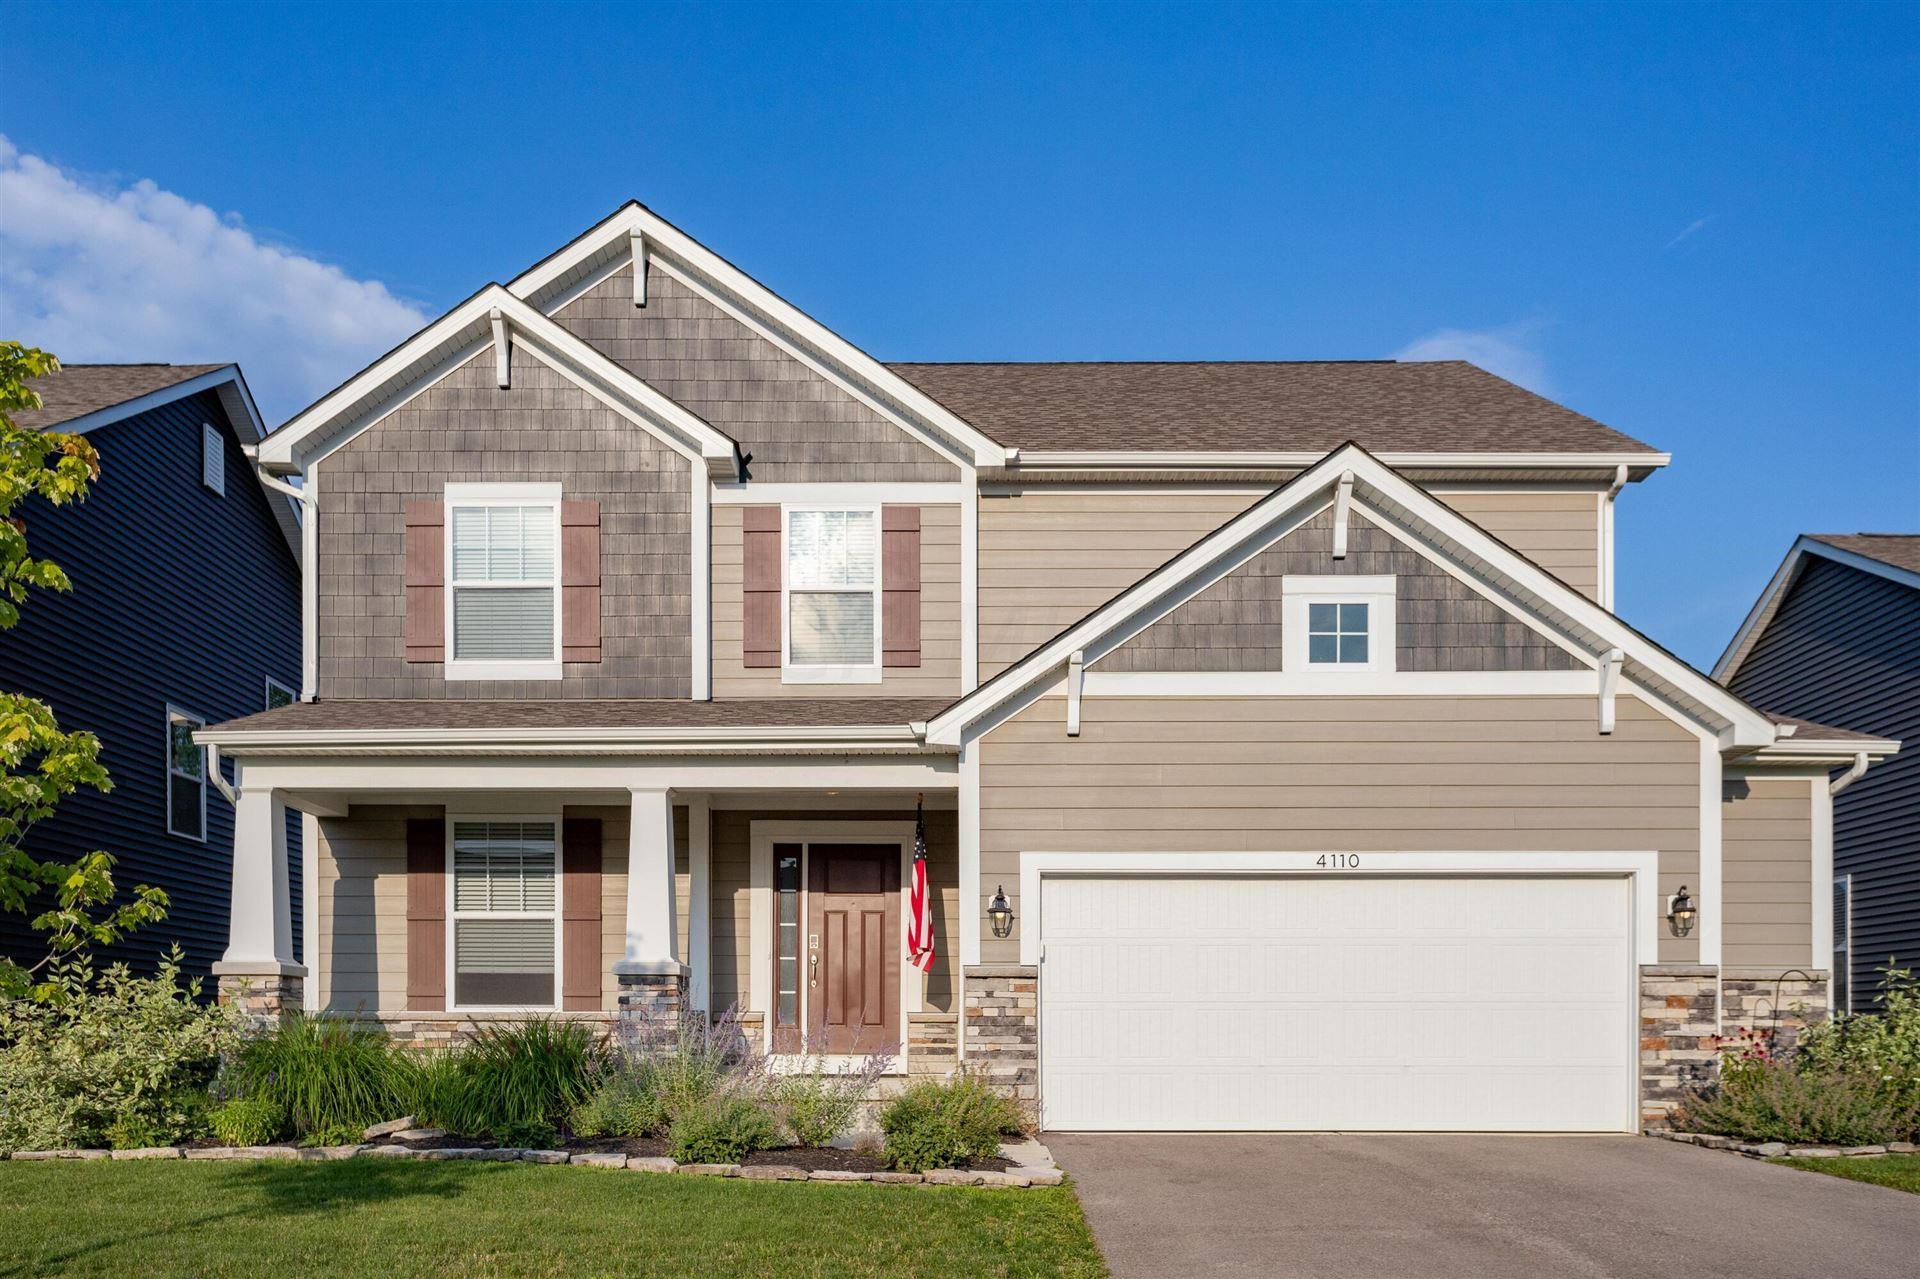 Photo of 4110 Bluebird Drive, Powell, OH 43065 (MLS # 221028675)